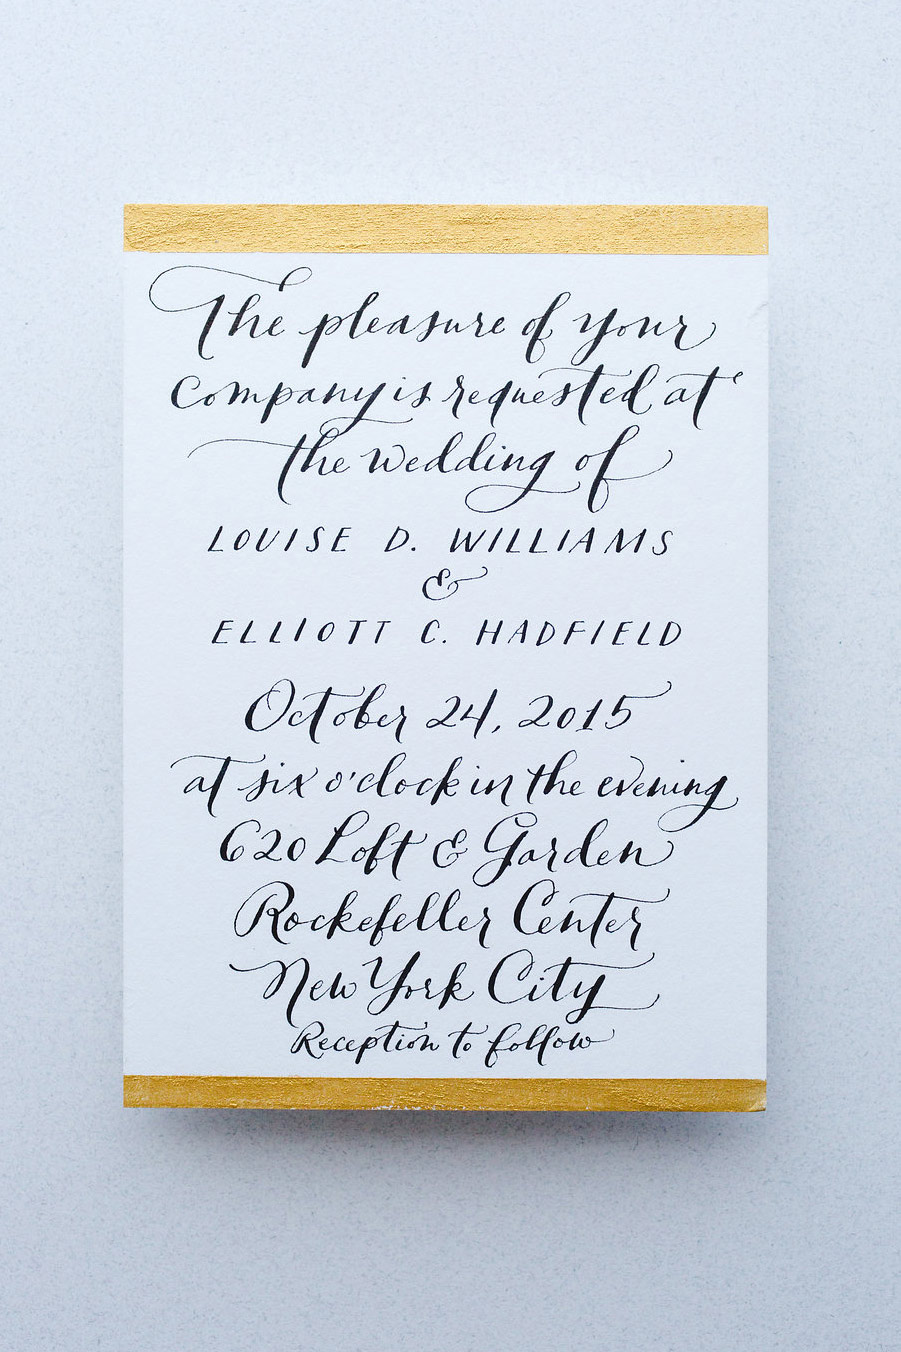 paperfinger-invitation-williamshadfield-optimized.jpg